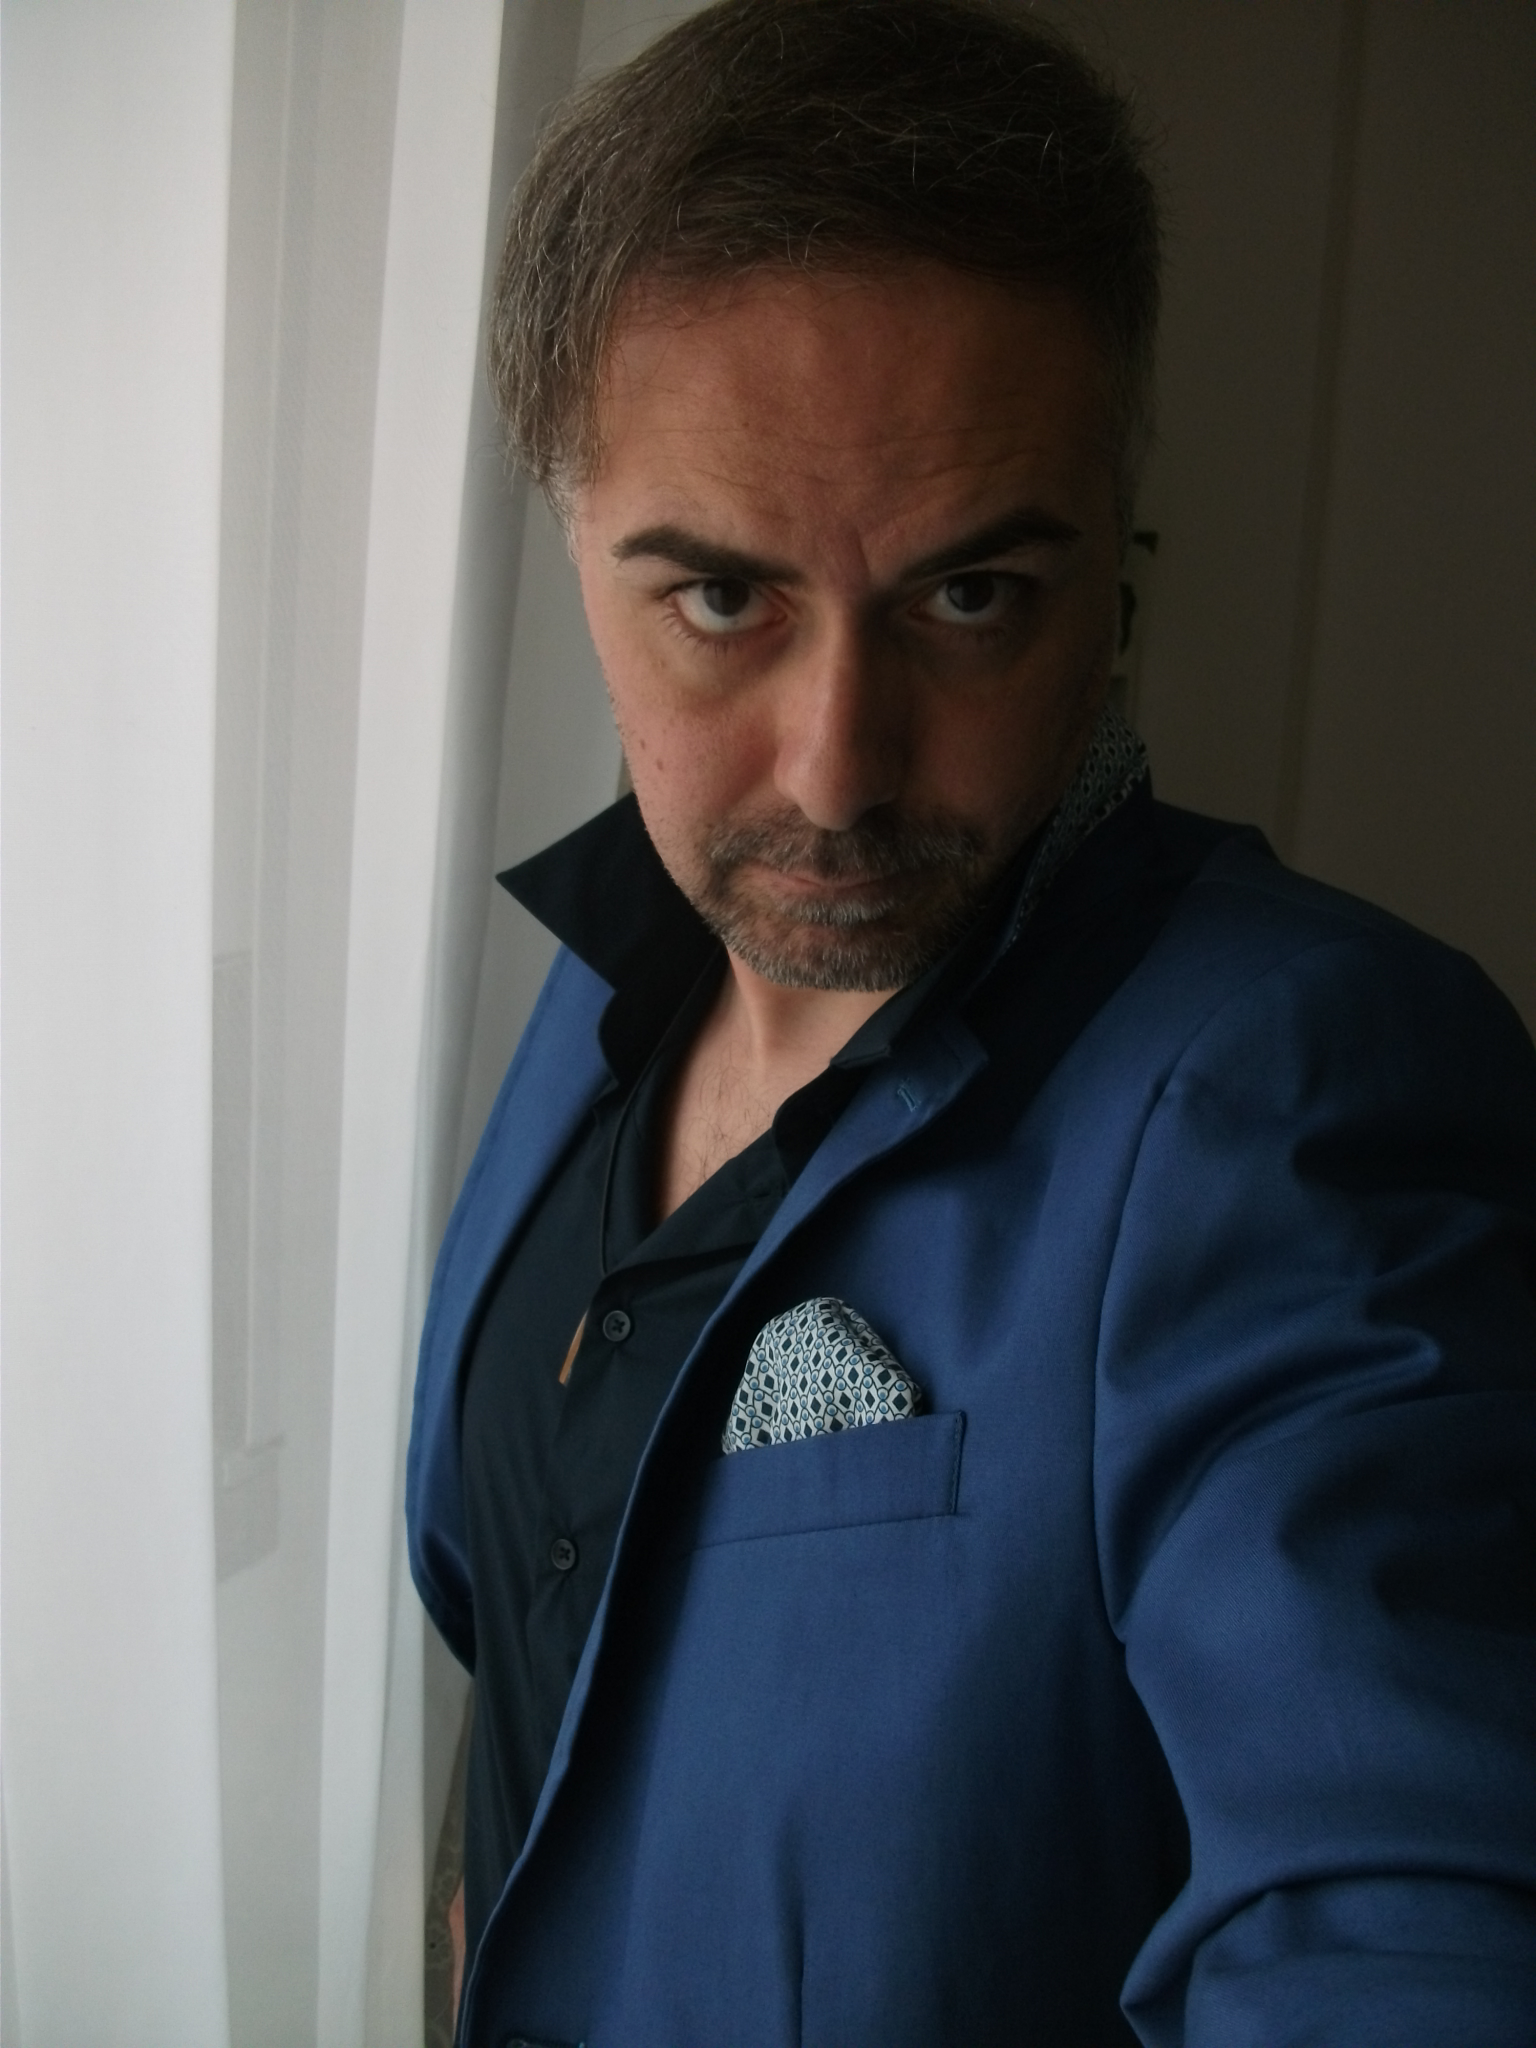 Giancarlo Finizio